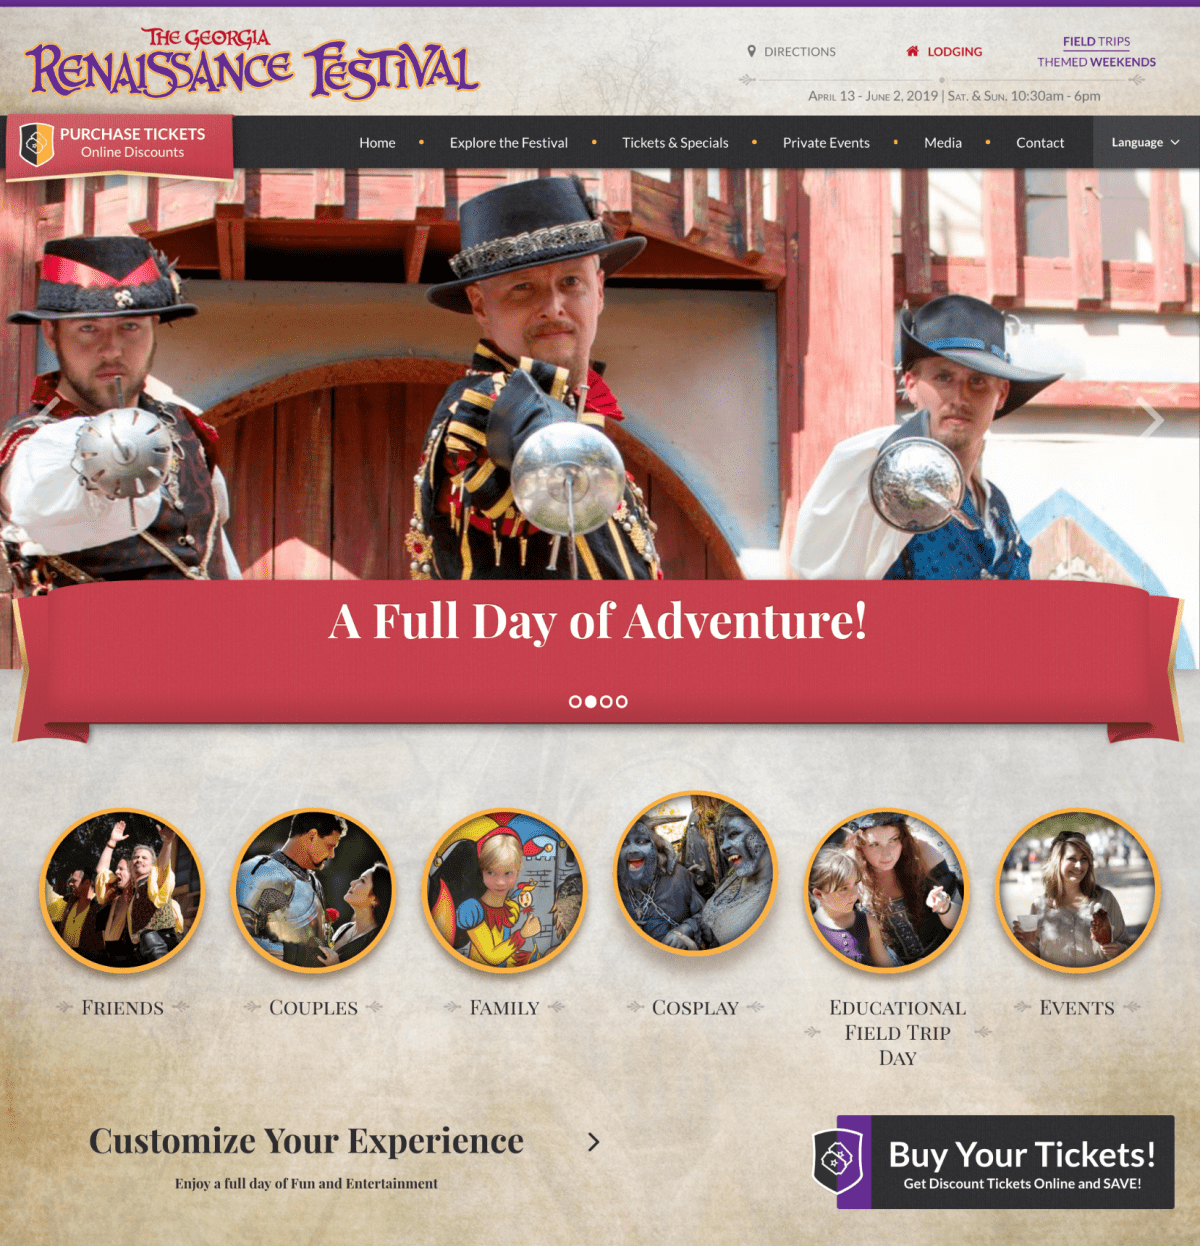 Image of website for Georgia Renaissance Festival